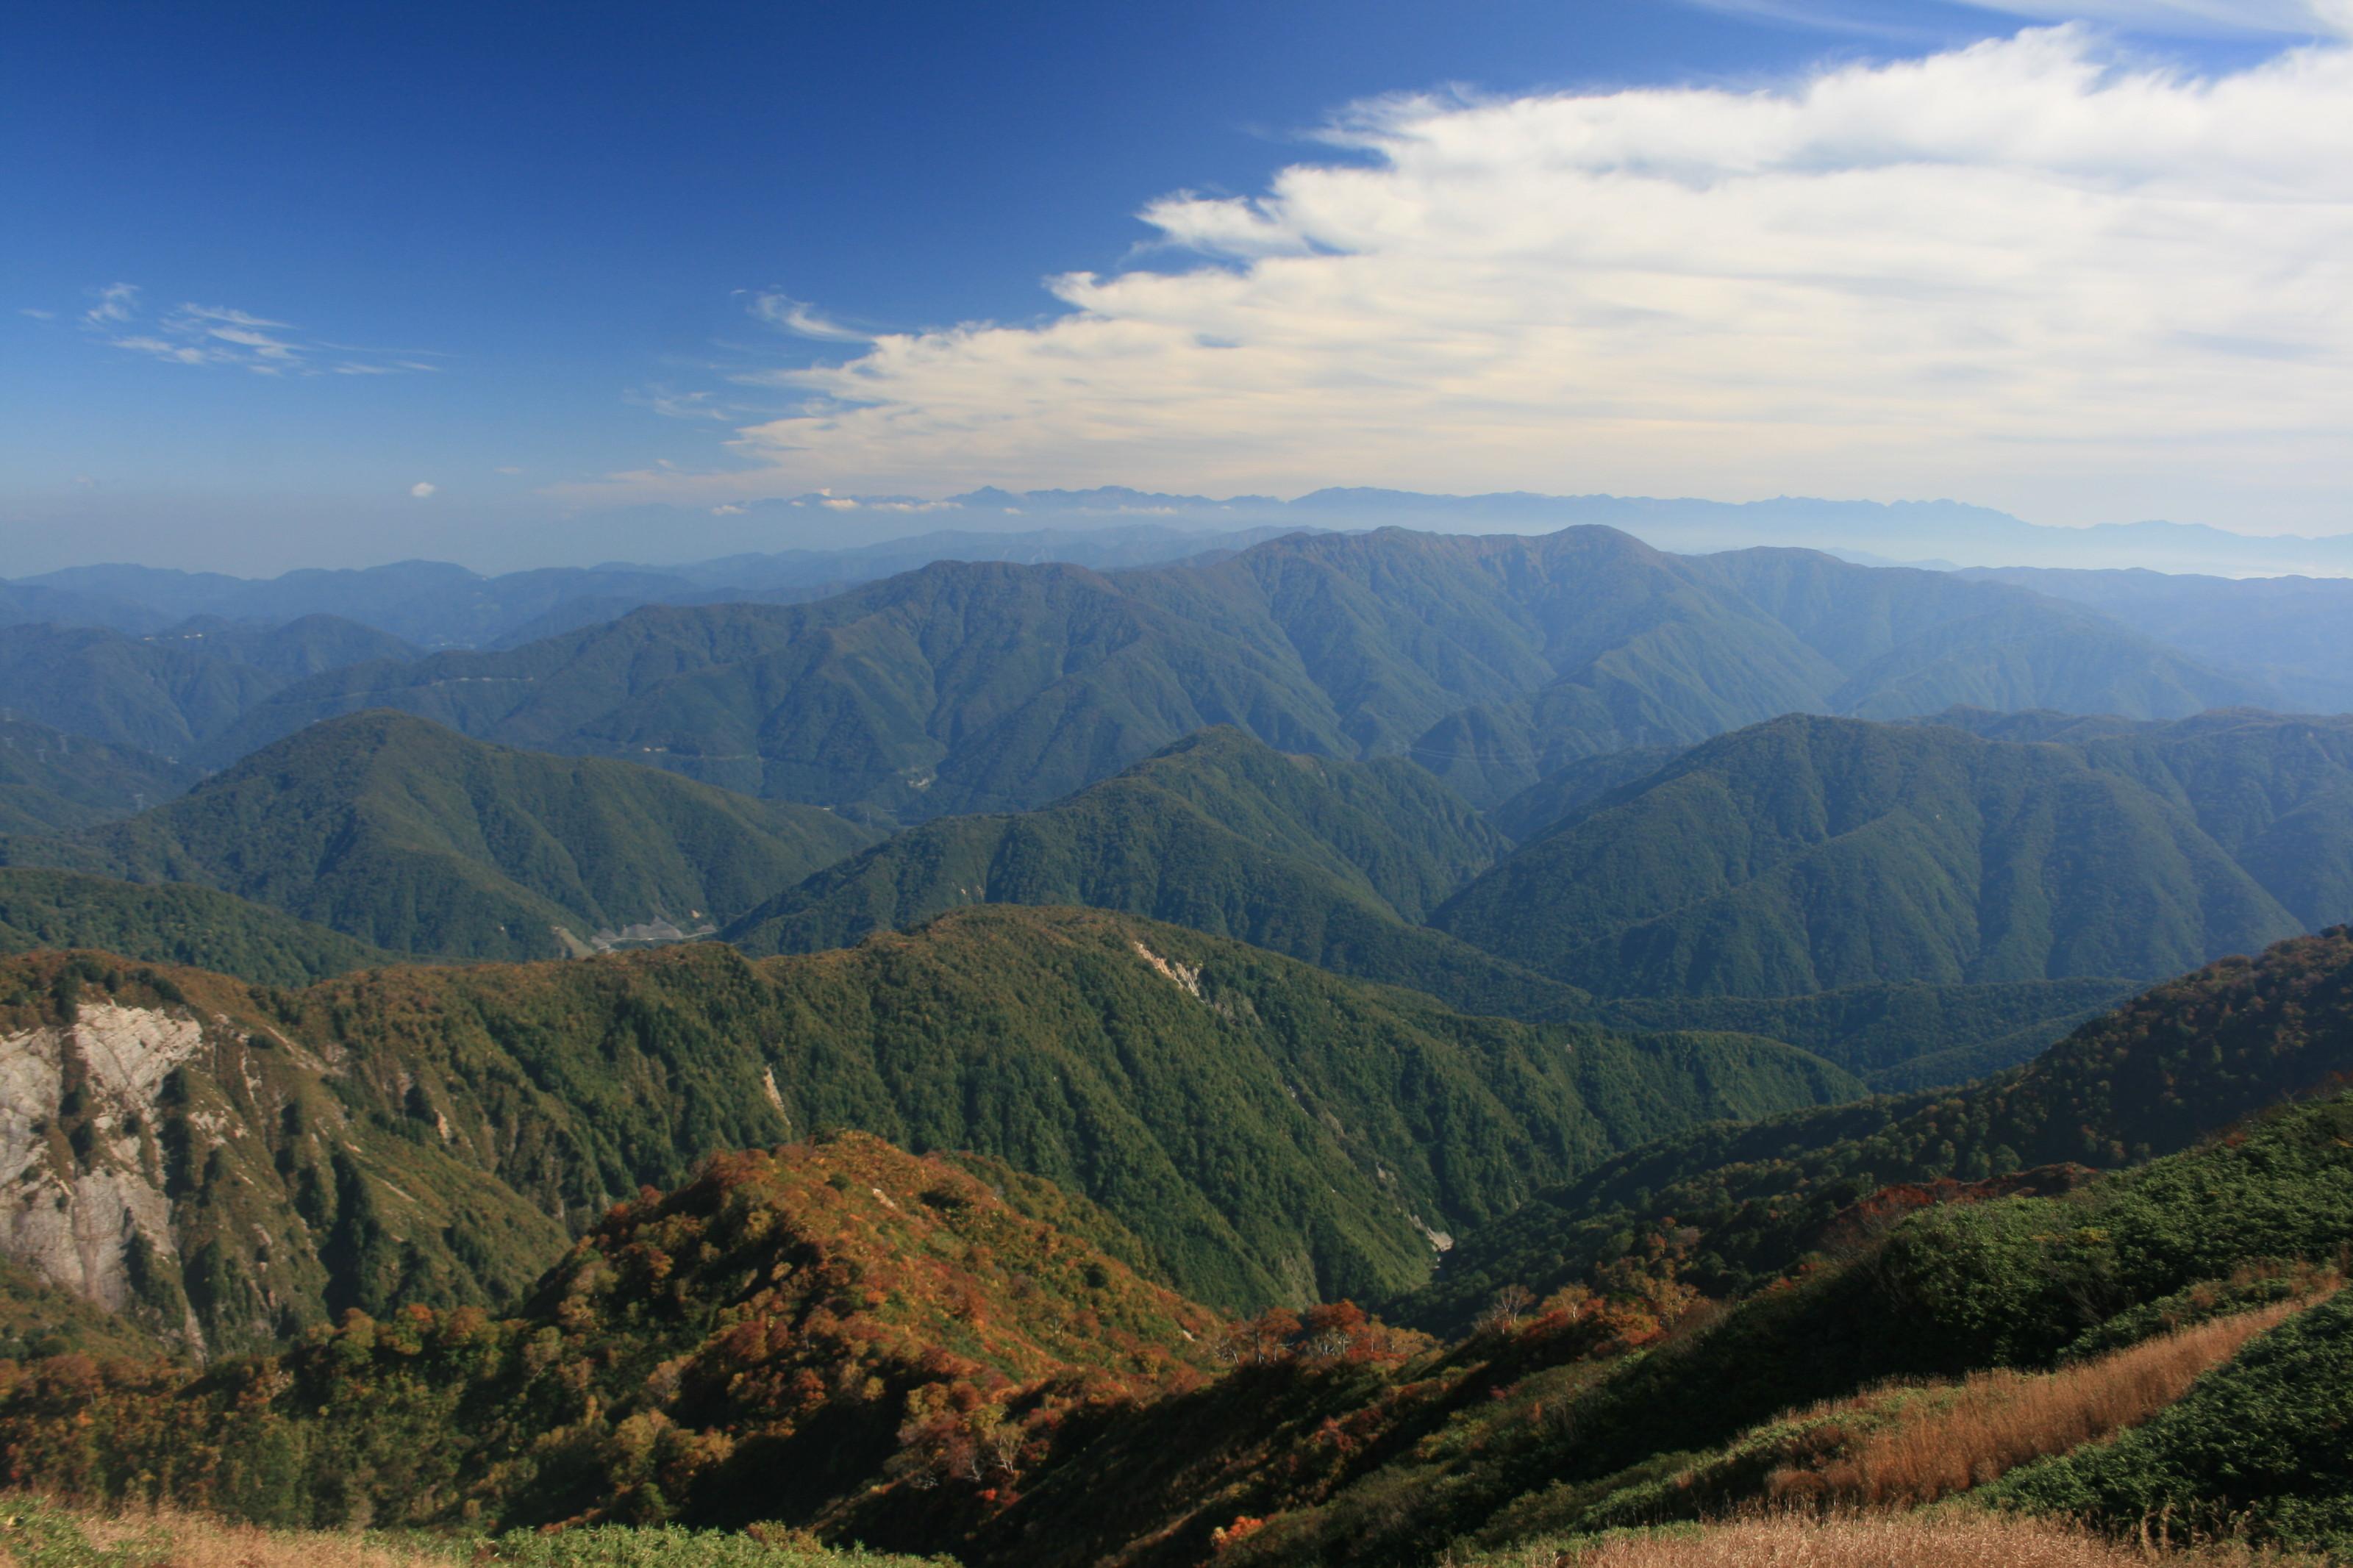 File:Mount Ningyo from Mount Ogasa.jpg - Wikimedia Commons